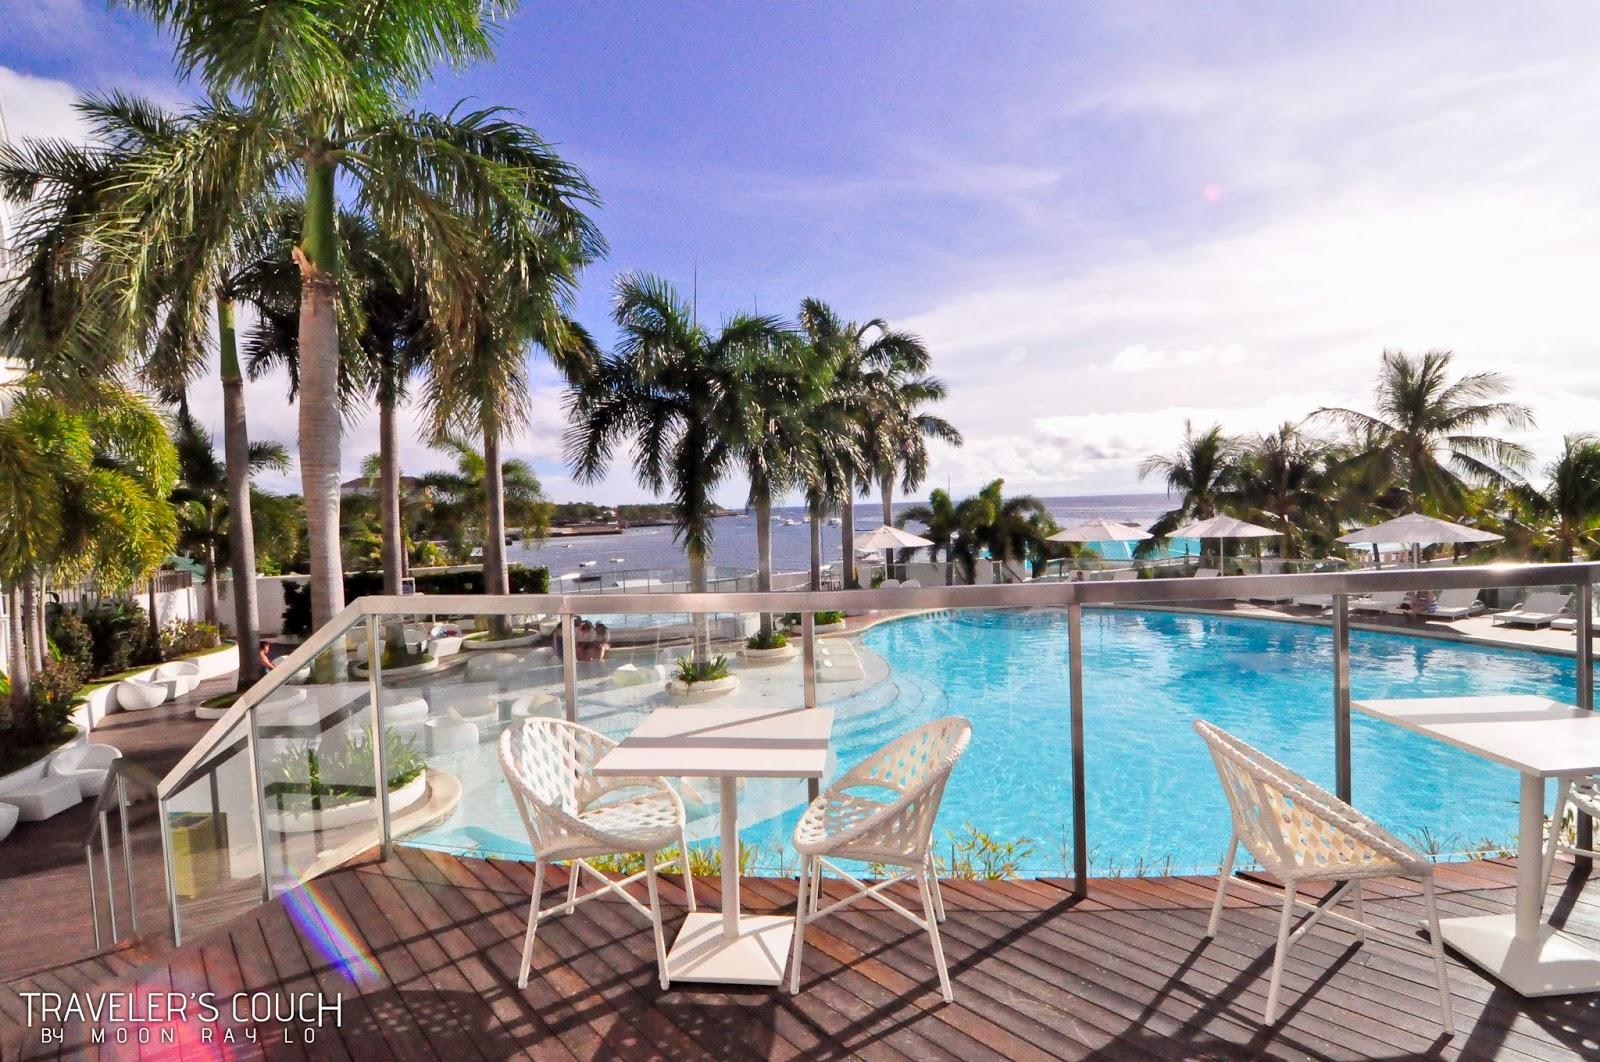 Moevenpick Hotel Mactan Island Cebu Experience Cebu 39 S Five Star Mediterranean Inspired Getaway